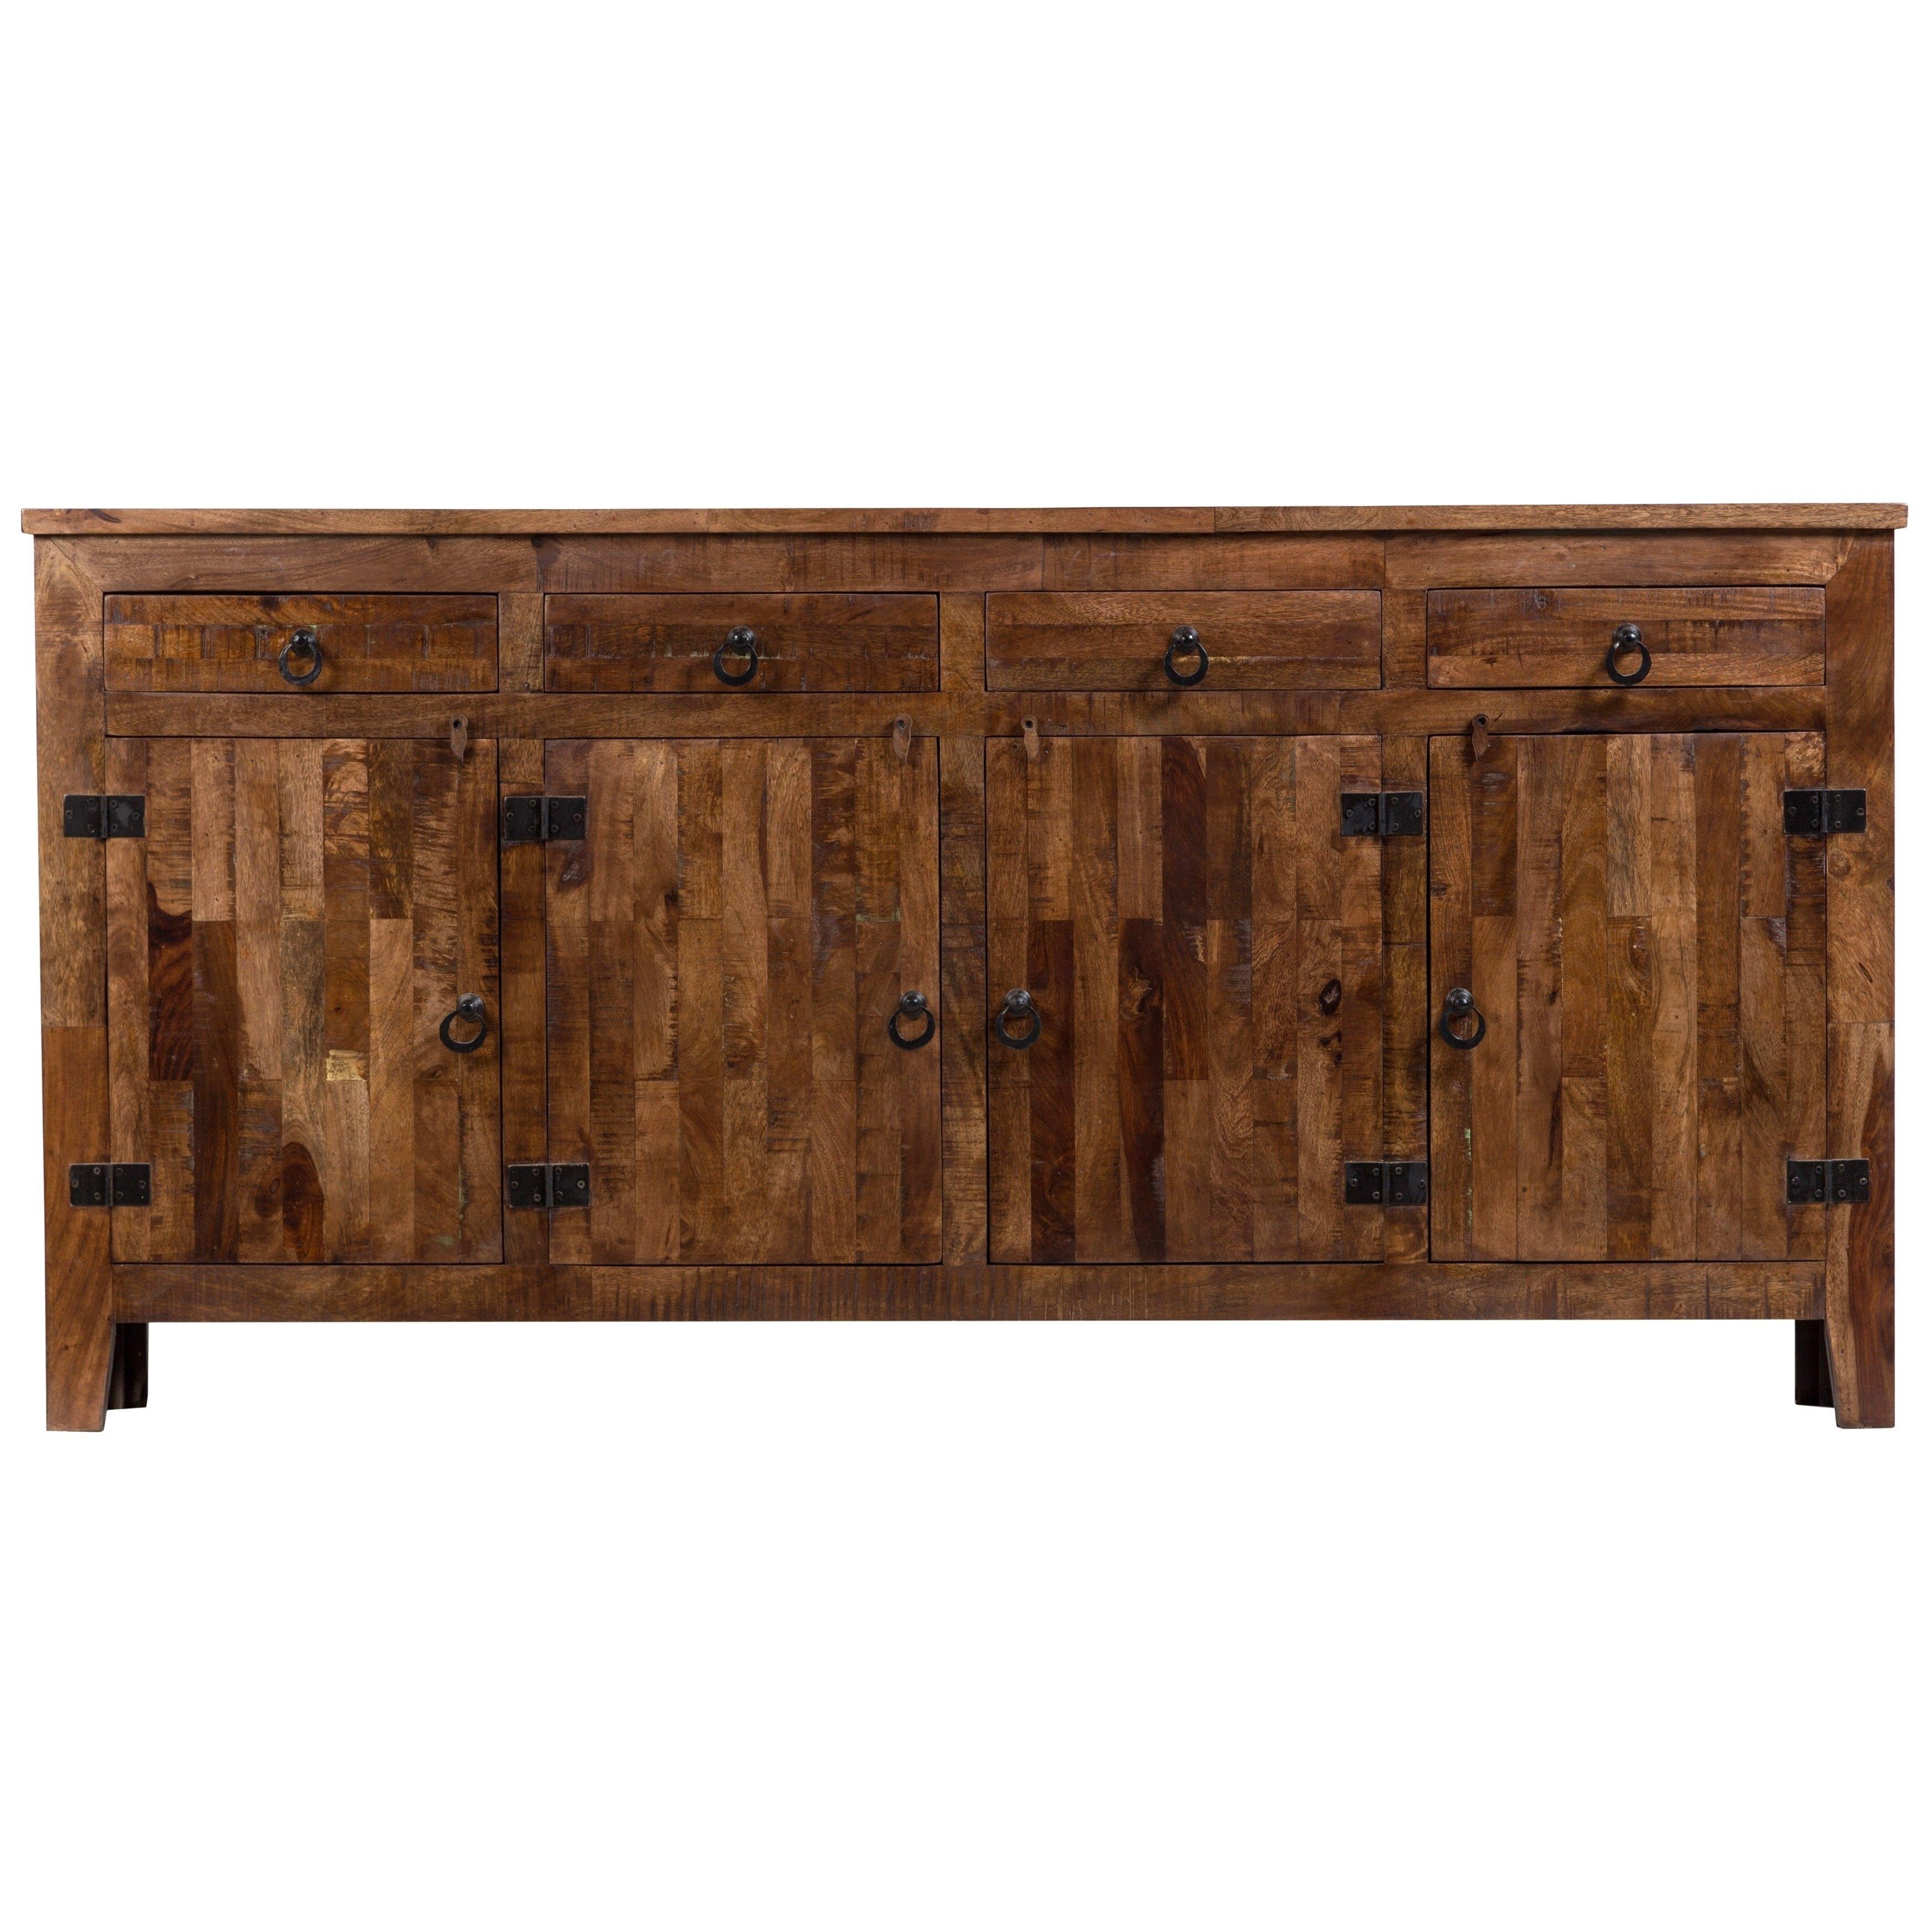 Shop Wanderloot Vintage Rustic Mango Wood 4 Door 4 Drawer Sideboard In Mango Wood Grey 4 Drawer 4 Door Sideboards (View 6 of 30)